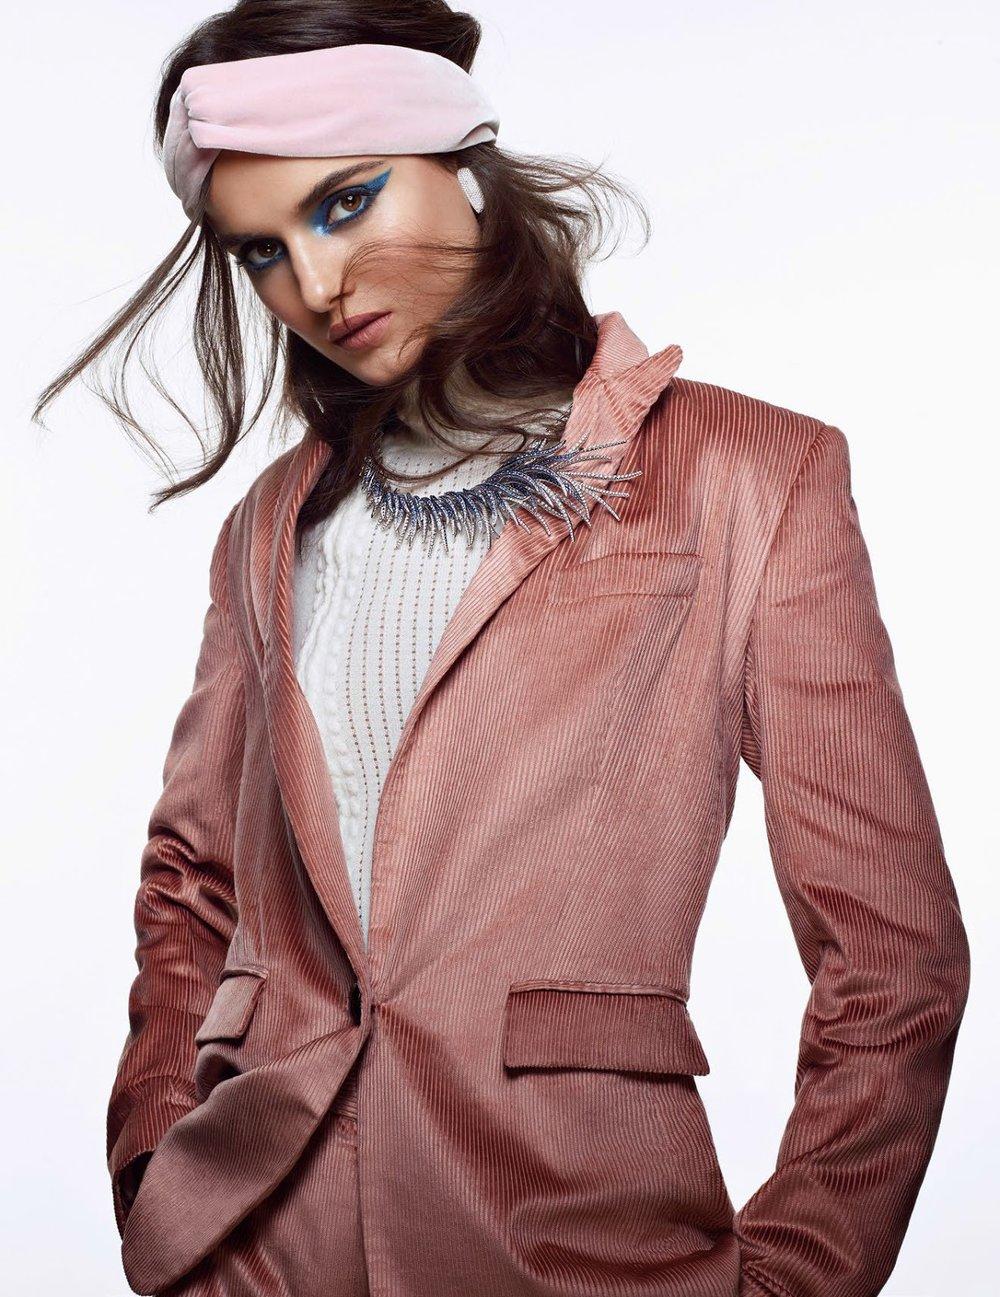 Vogue Arabia December 2017 - 1.jpg